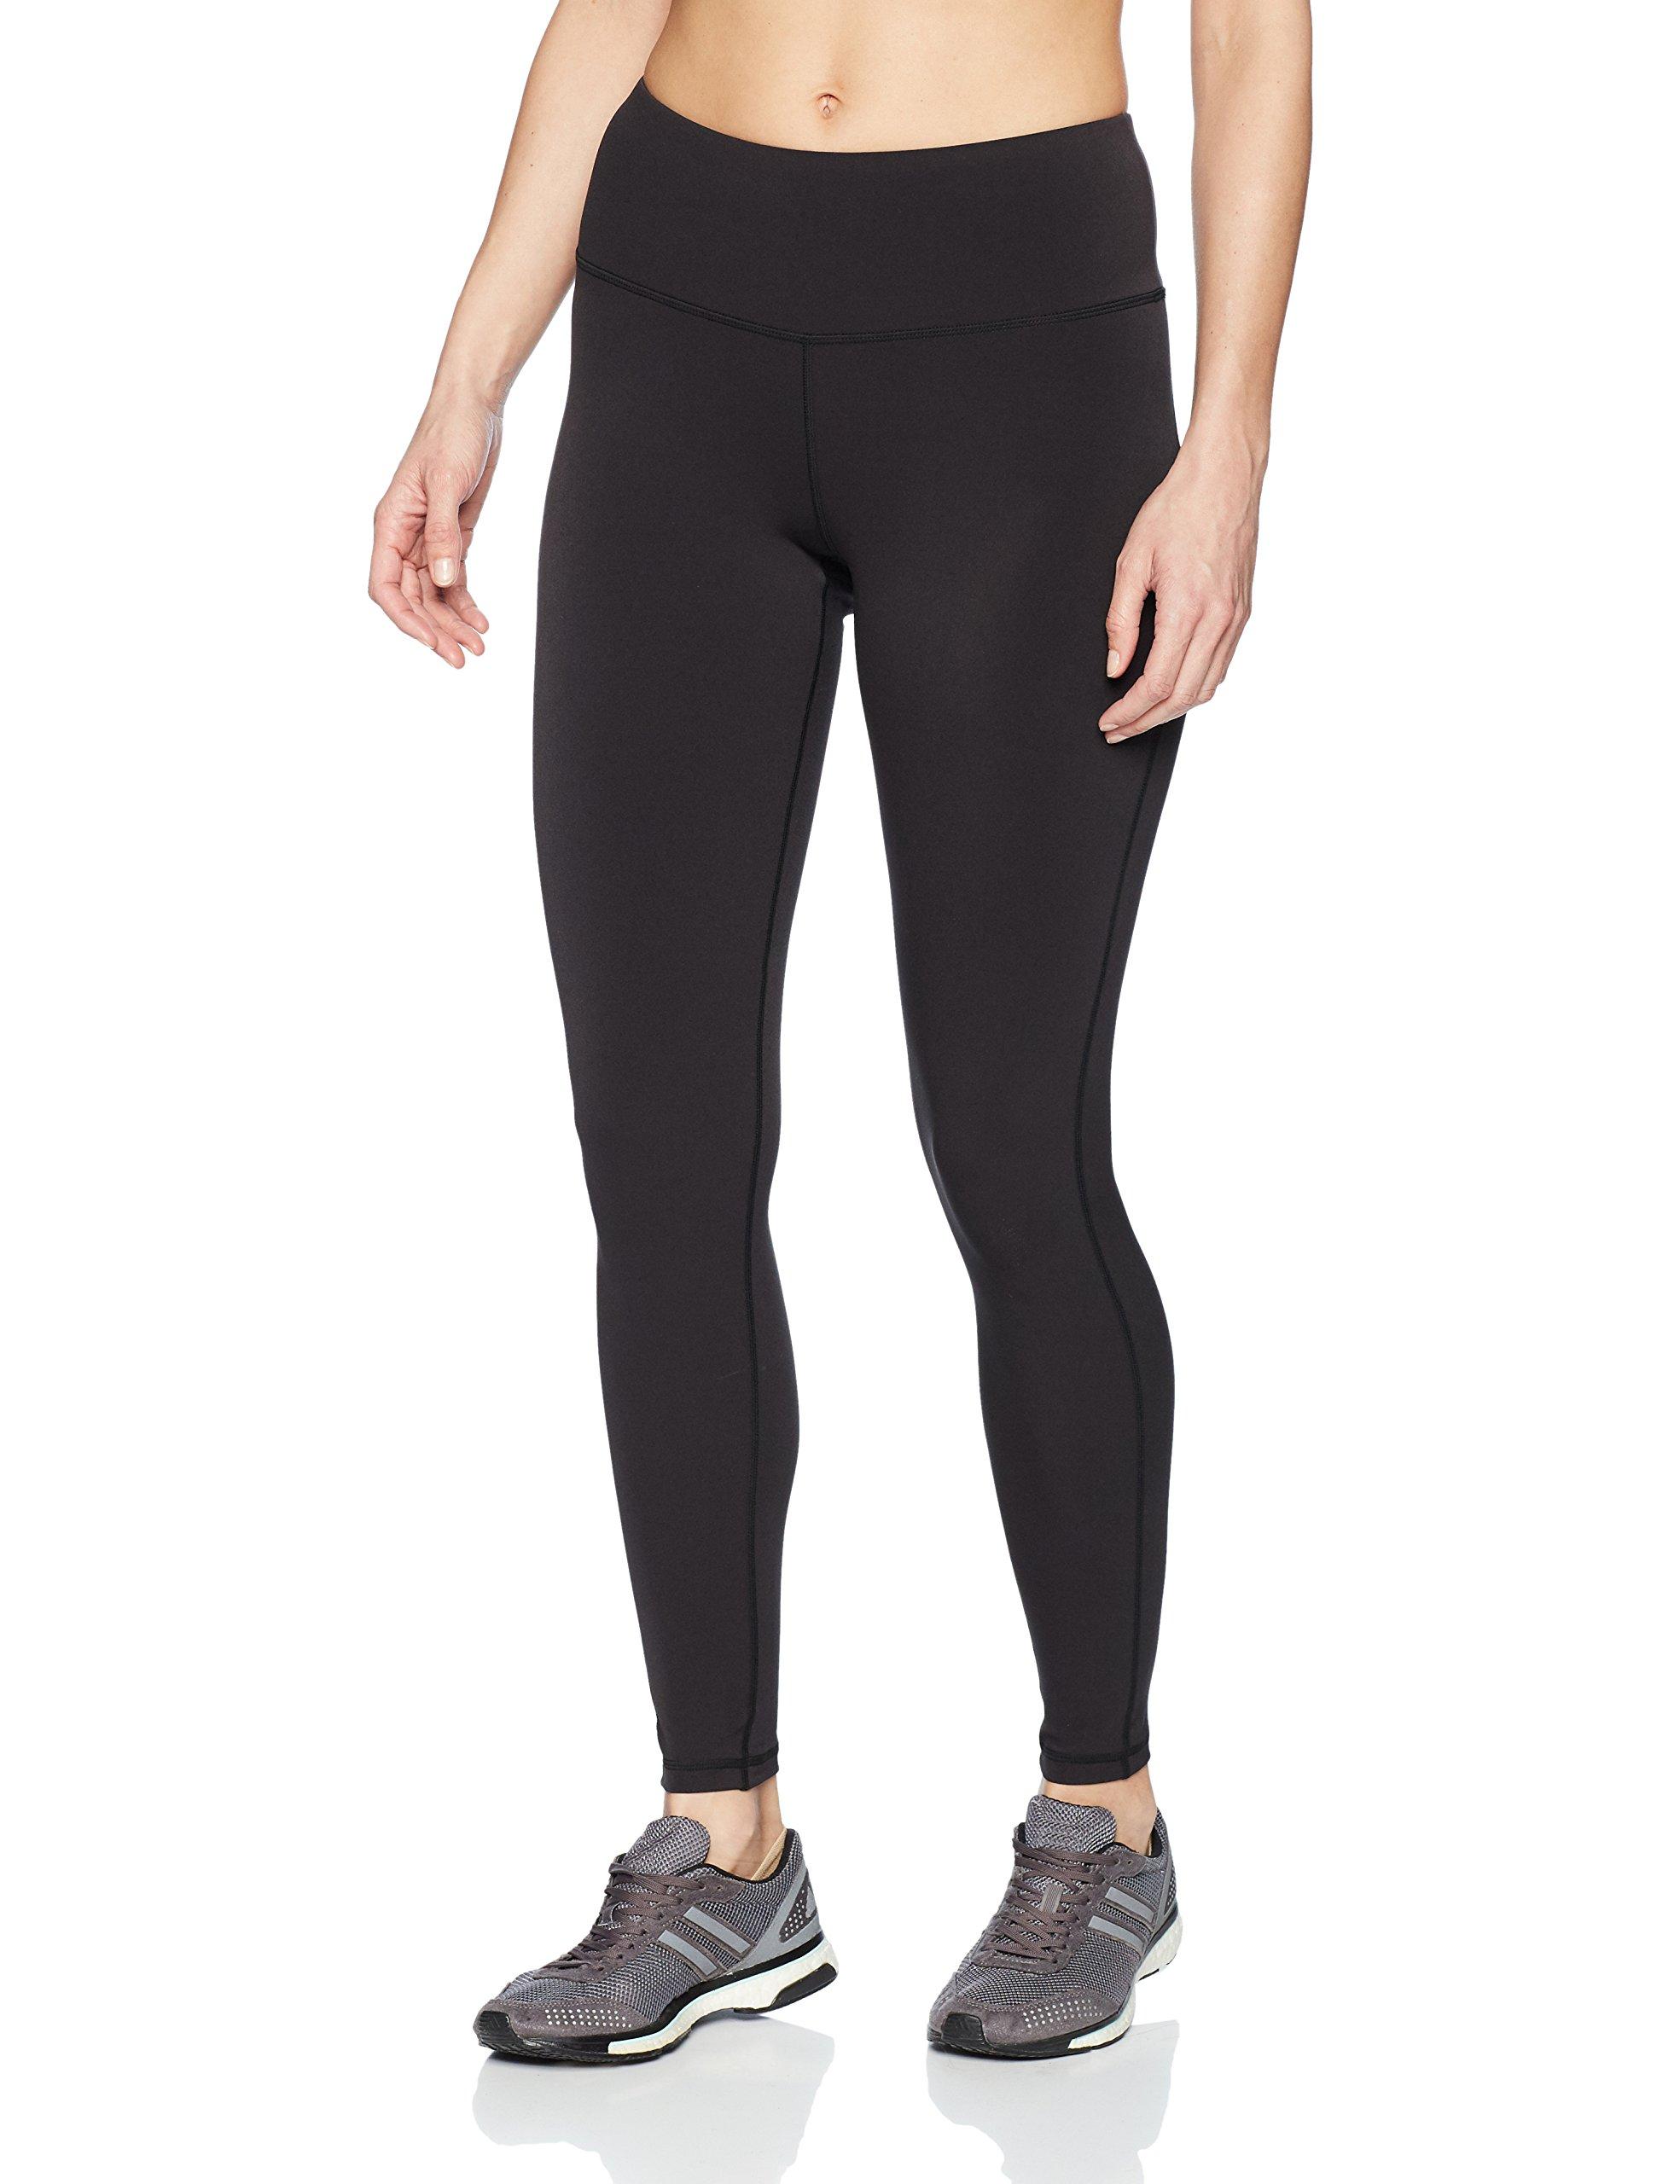 Amazon Essentials Women's Performance Mid-Rise Full-Length Active Legging